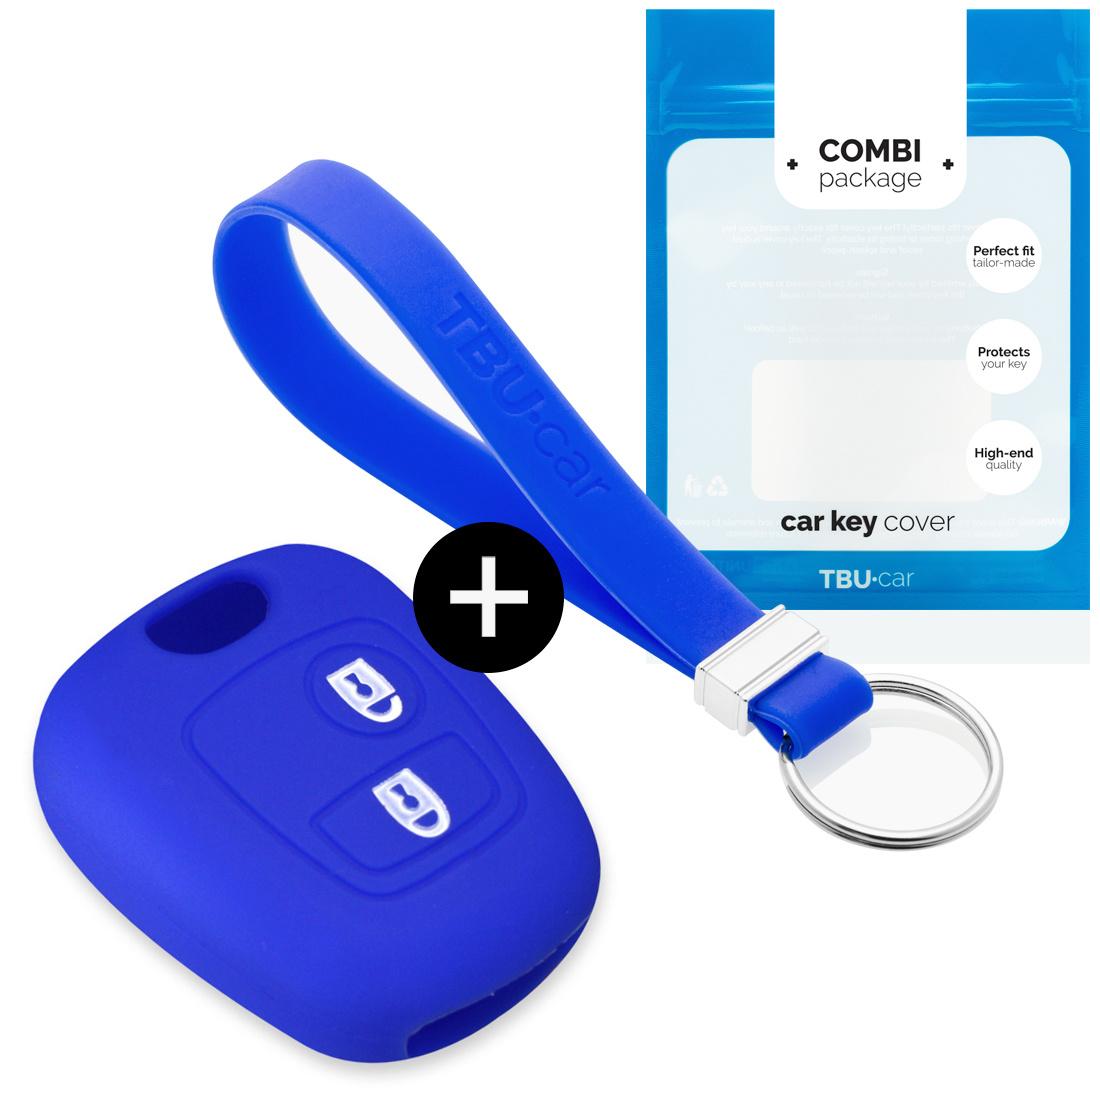 TBU car Autoschlüssel Hülle für Peugeot 2 Tasten - Schutzhülle aus Silikon - Auto Schlüsselhülle Cover in Blau